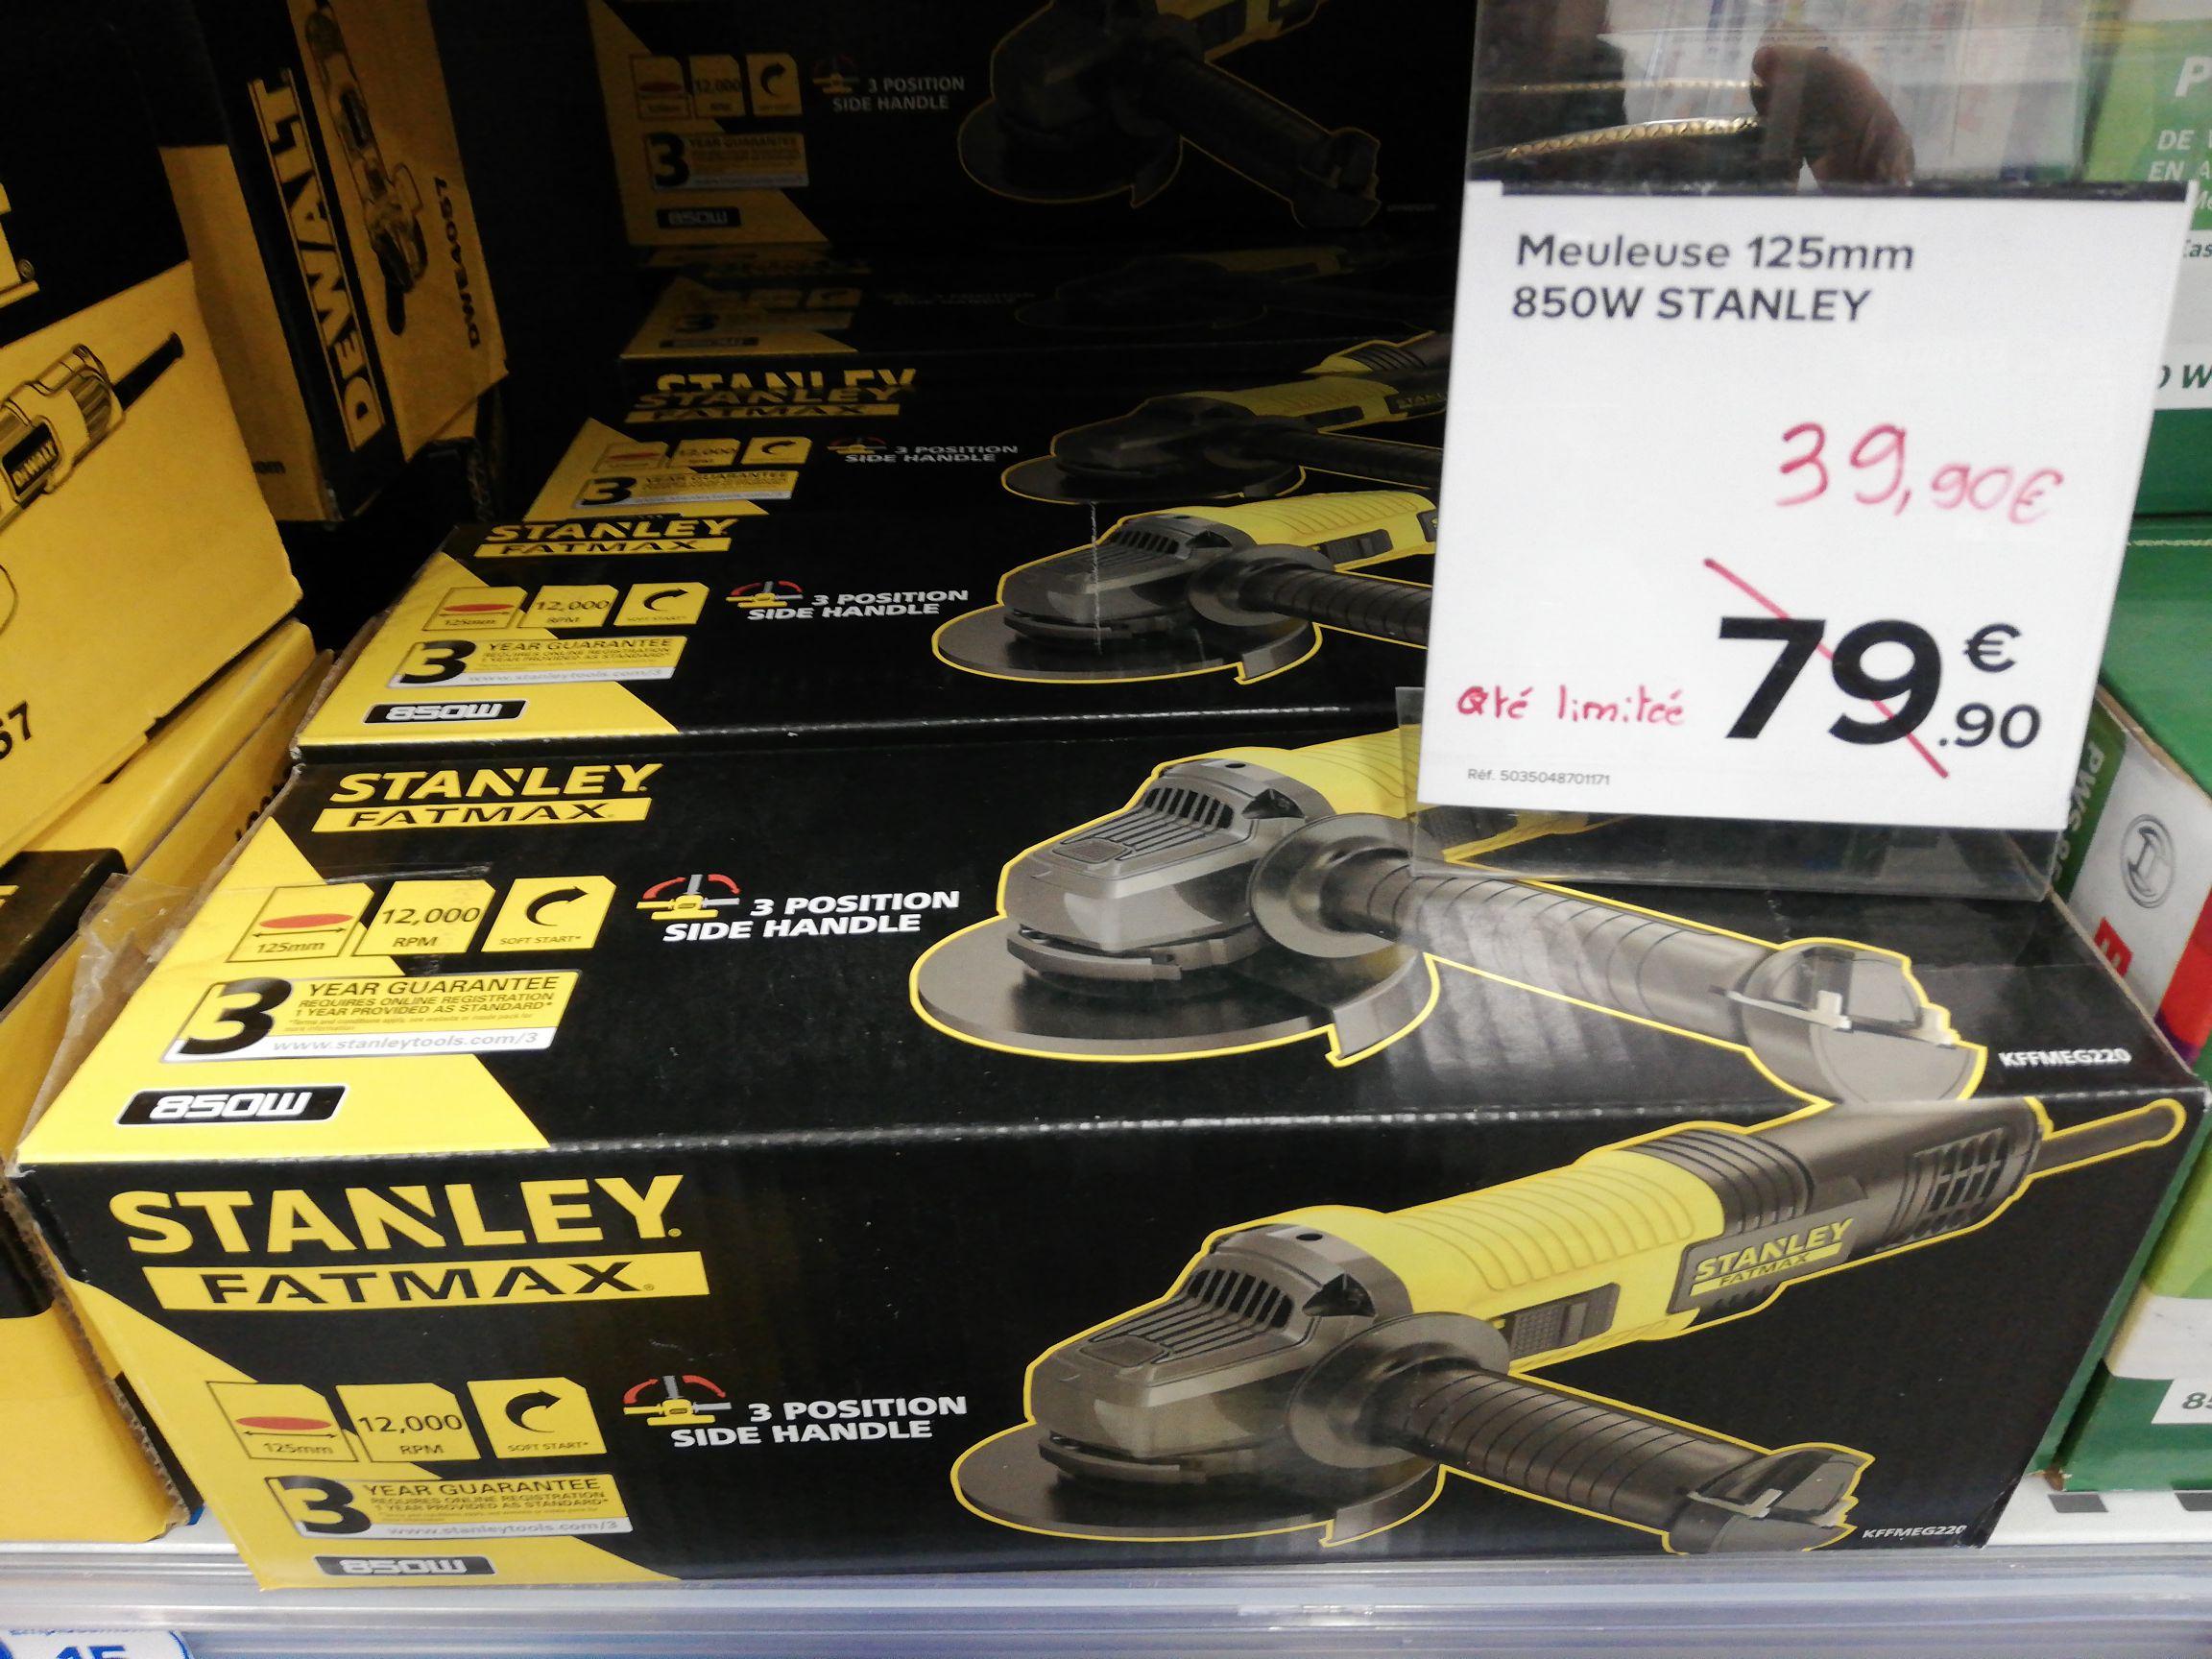 Meuleuse Stanley Fatmax KFFMEG220-QS 125 mm - Perpignan (66)